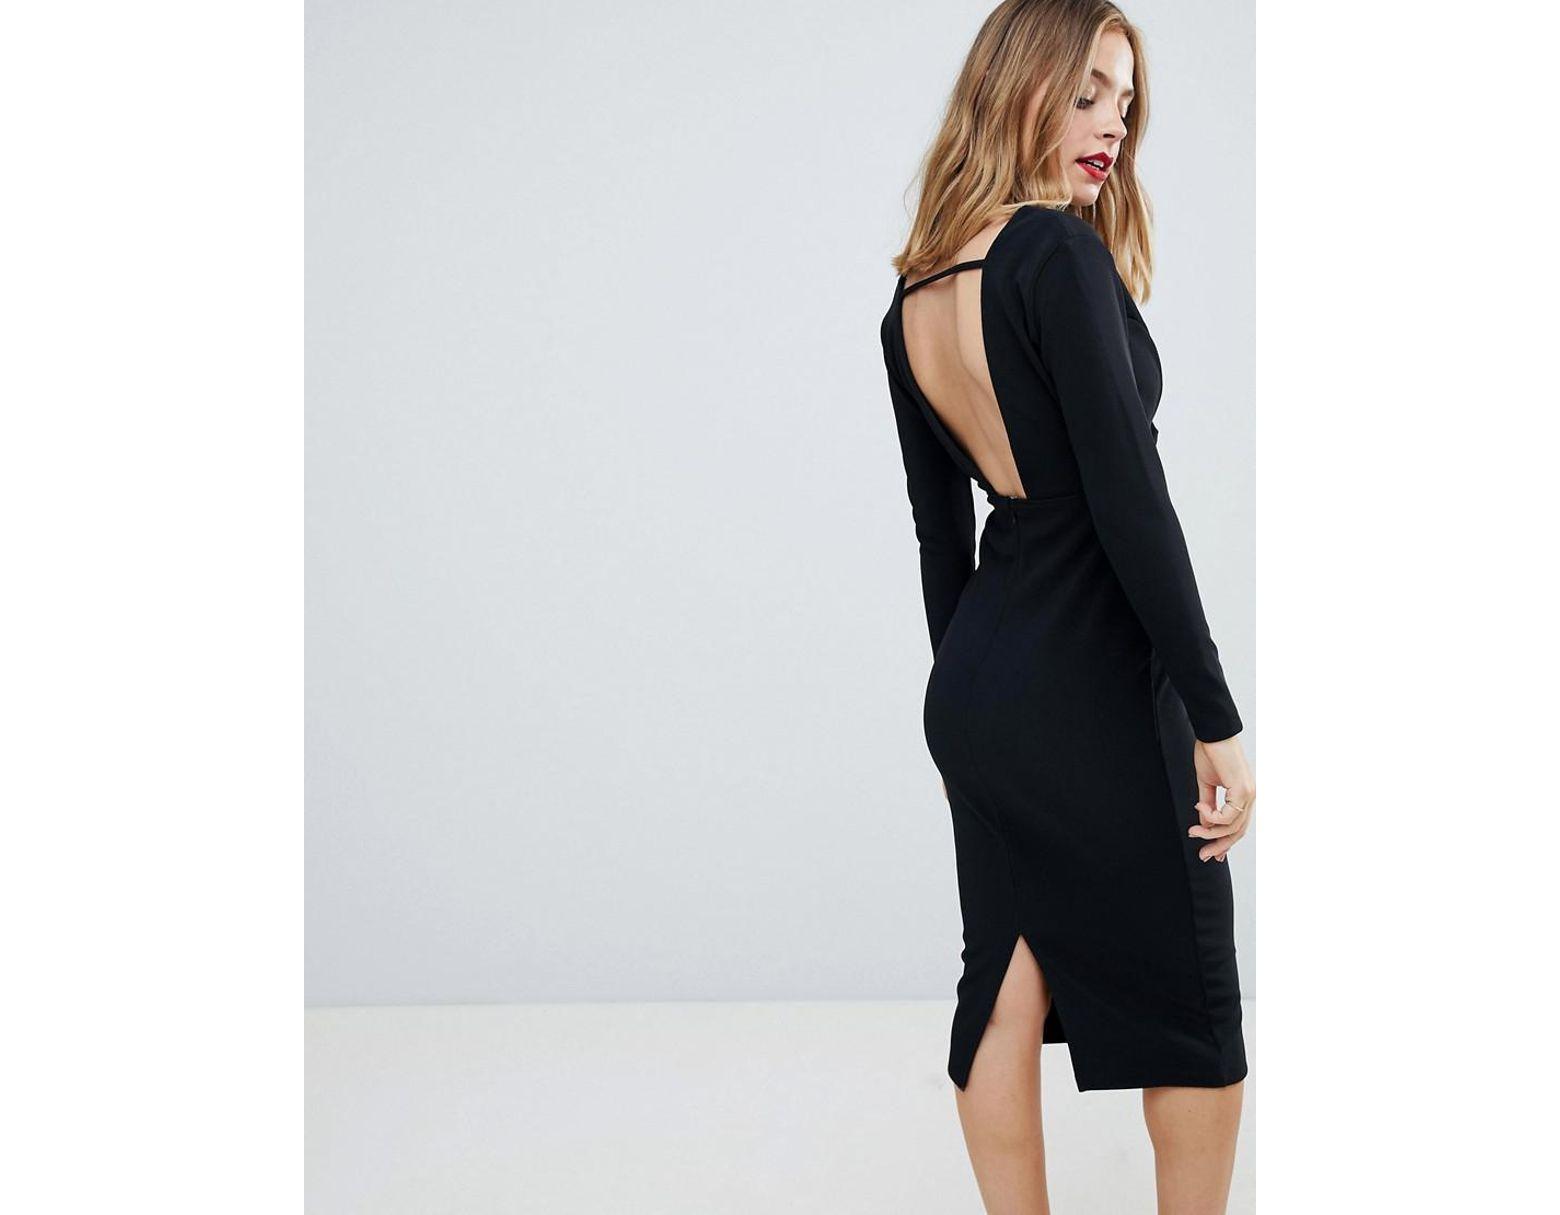 681a3dcbee ASOS Asos Design Petite Long Sleeve Exposed Underwire Bodycon Midi Dress in  Black - Lyst